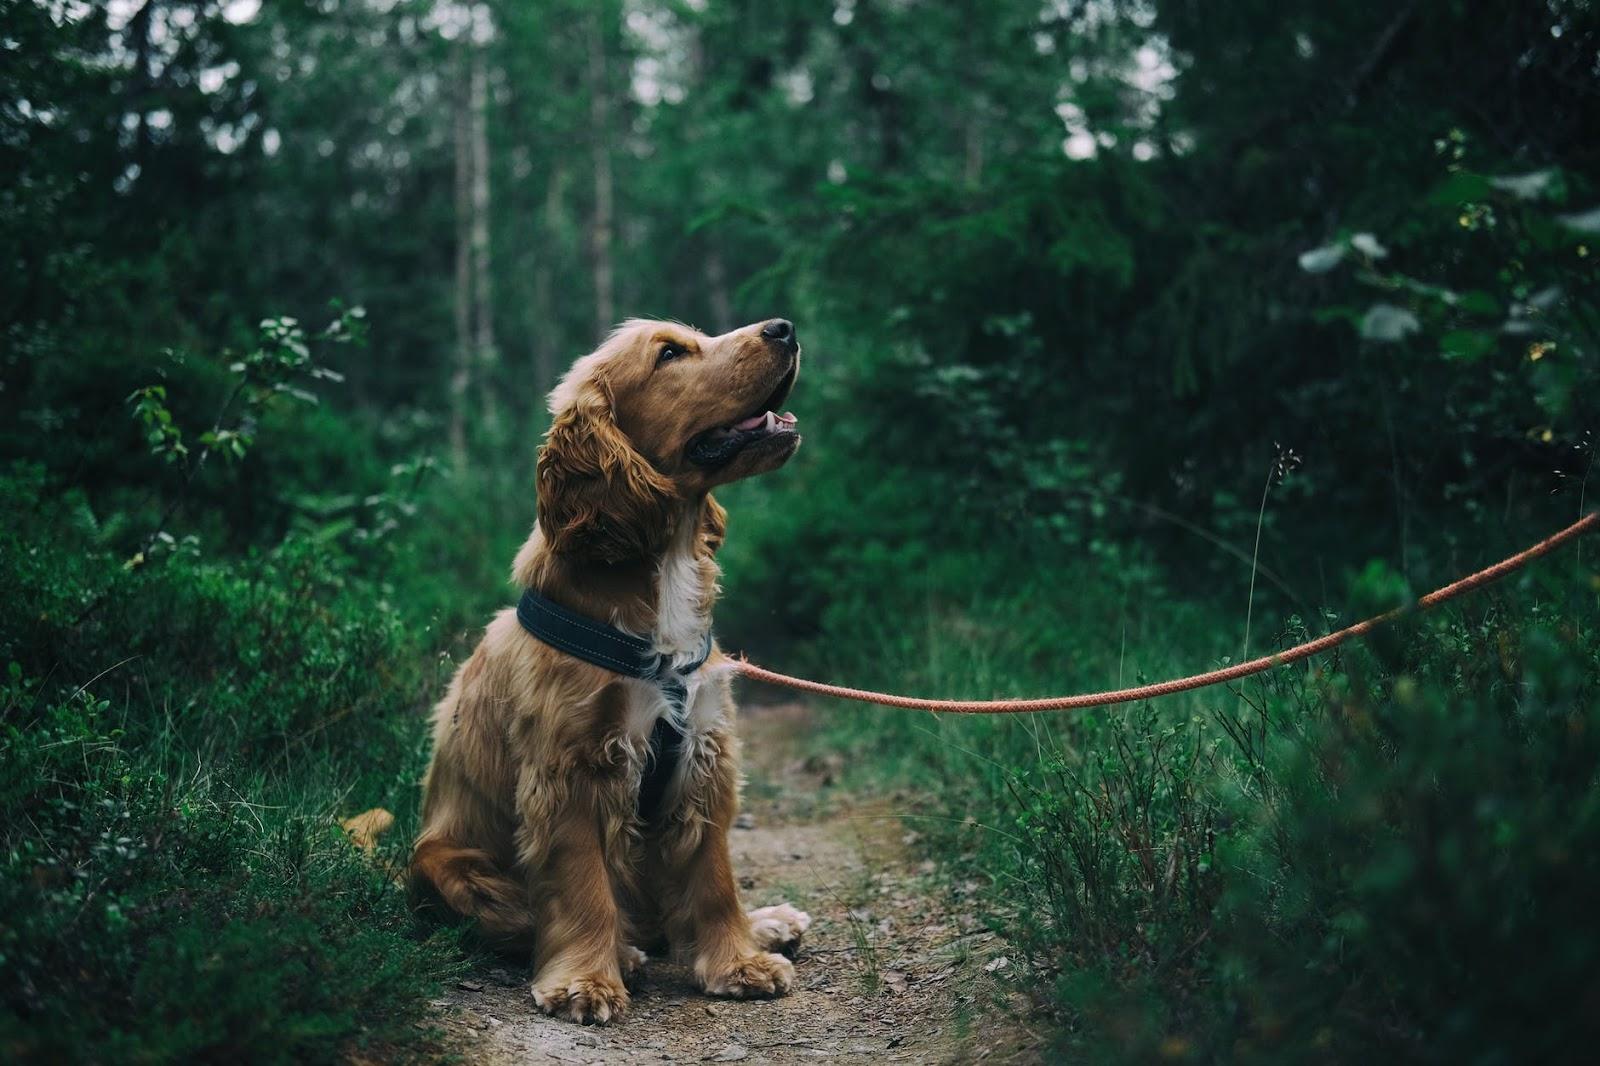 natural remedies for depression get a dog